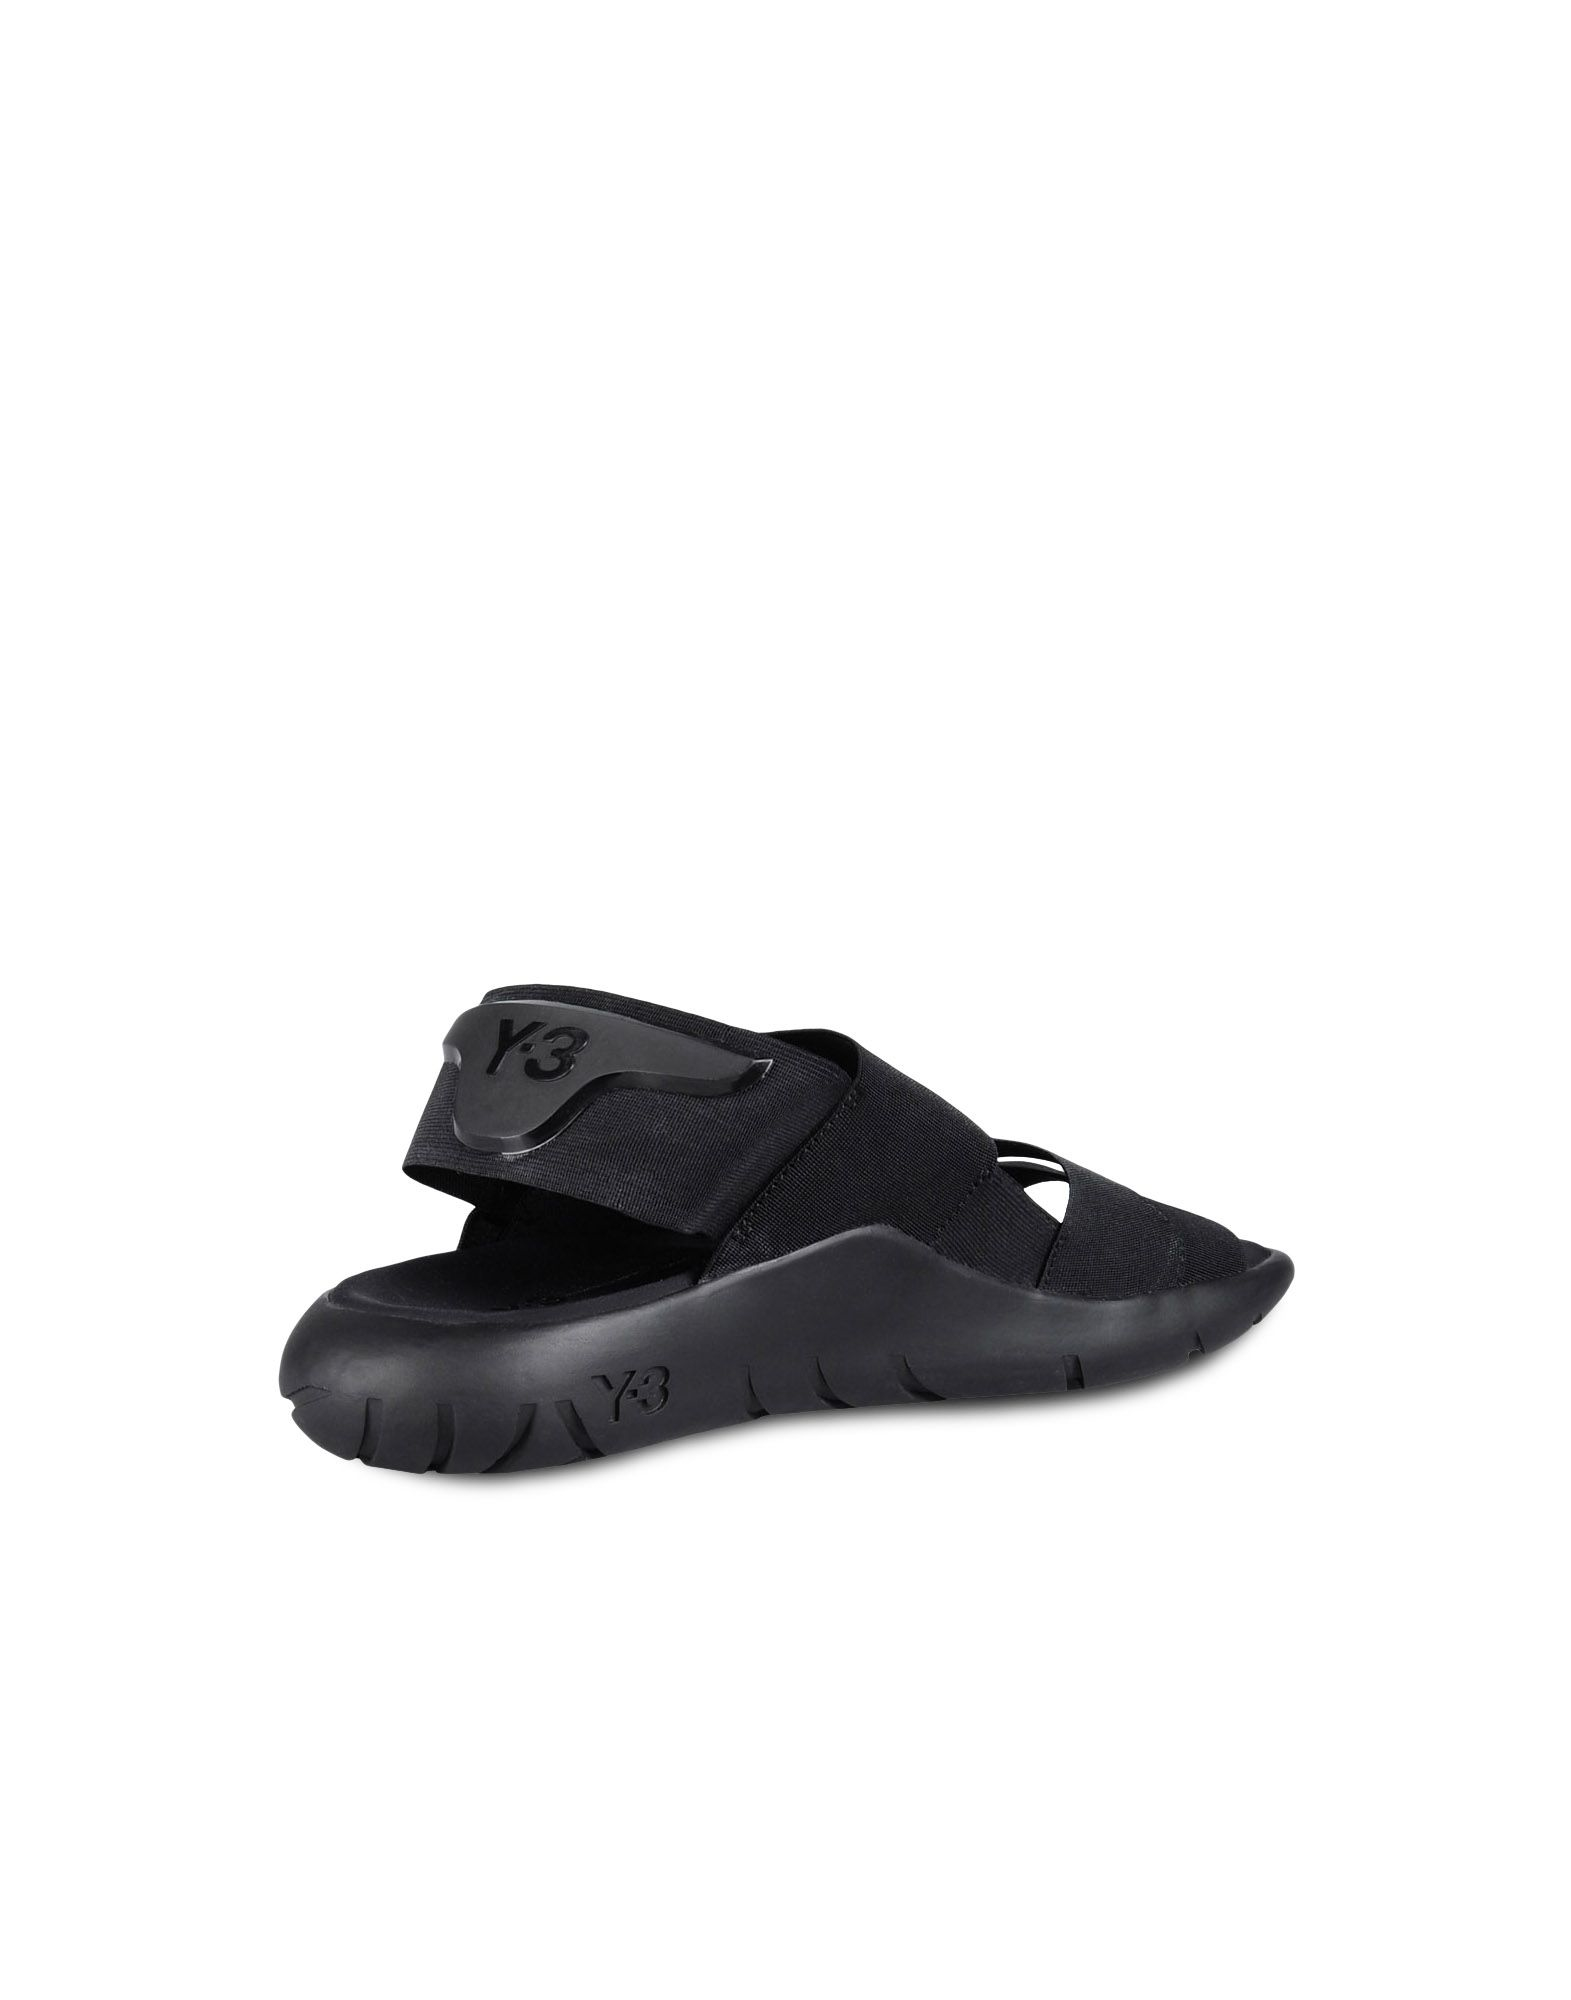 aa48b9fd6931f Y-3 Qasa Sandals in Black for Men - Lyst